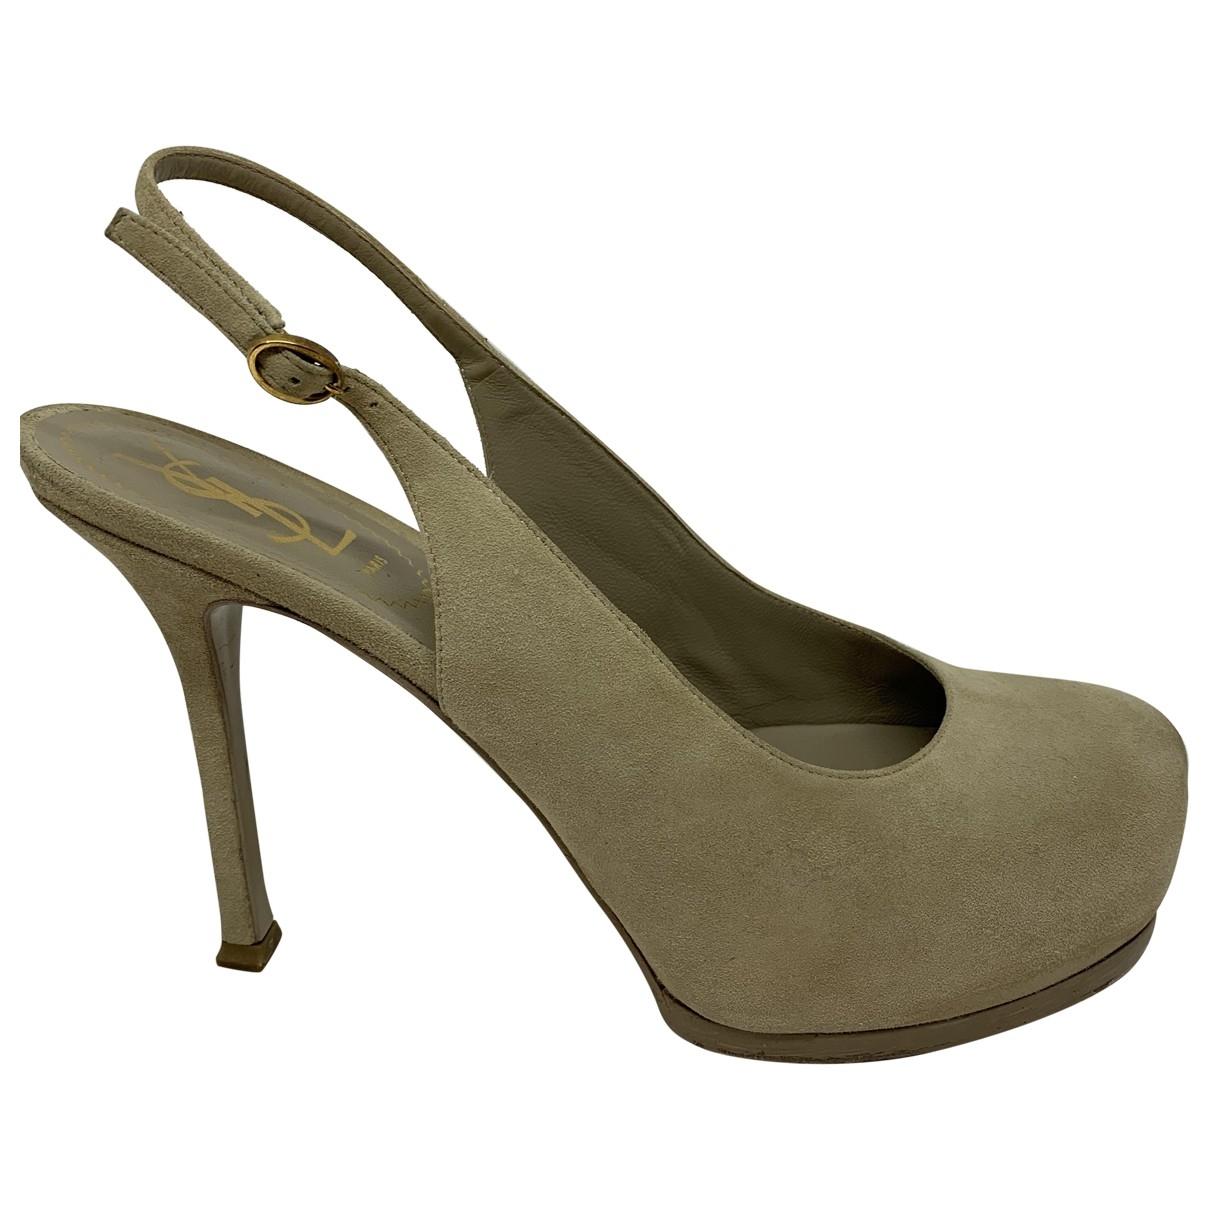 Yves Saint Laurent Trib Too Grey Suede Heels for Women 38 EU